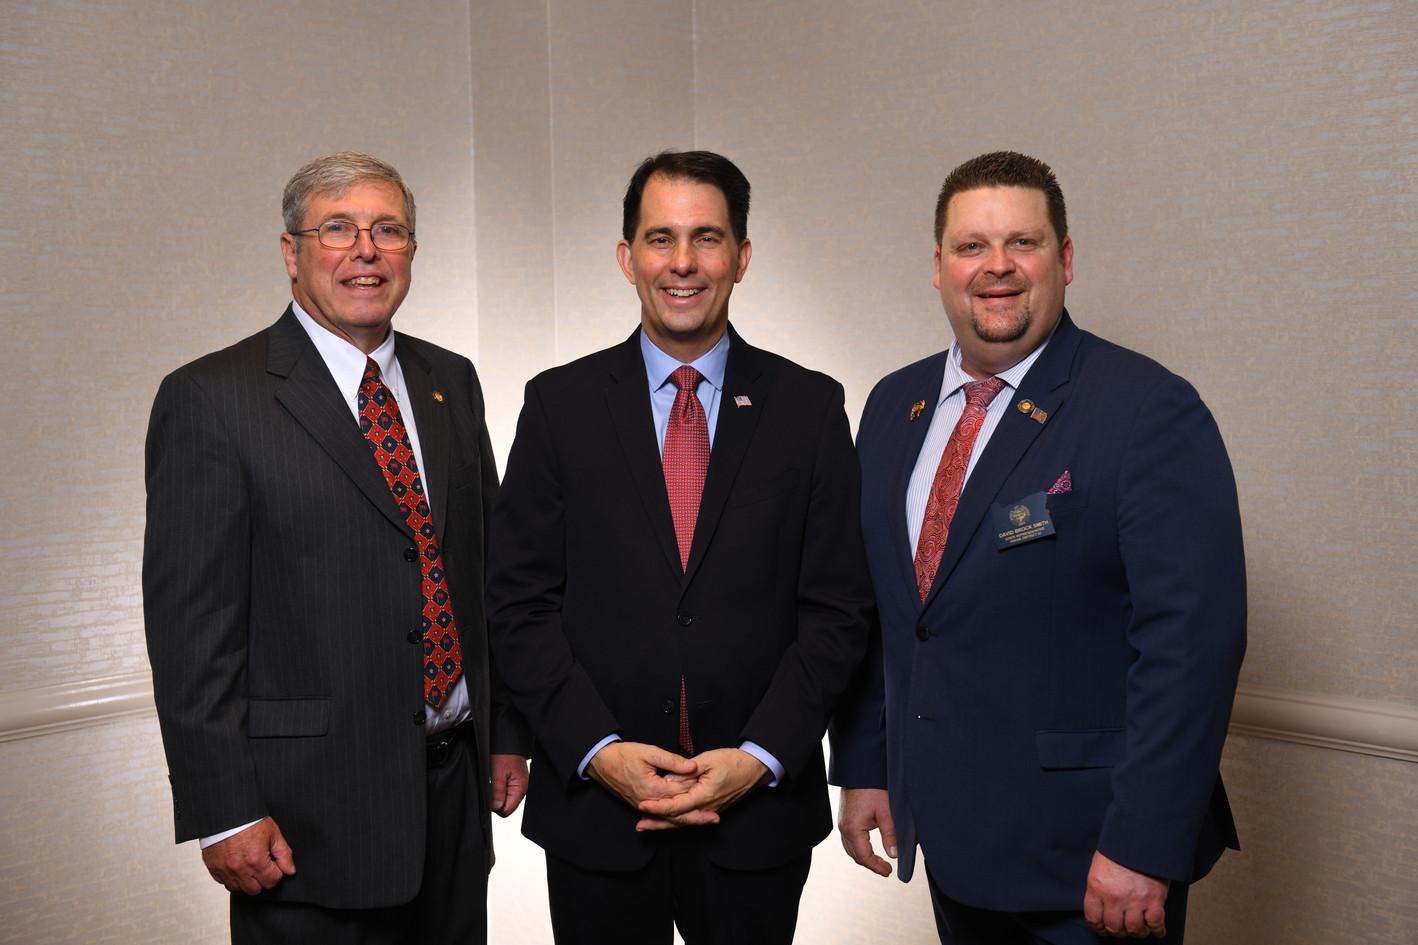 Rich Vial, Scott Walker, David Brock Smith